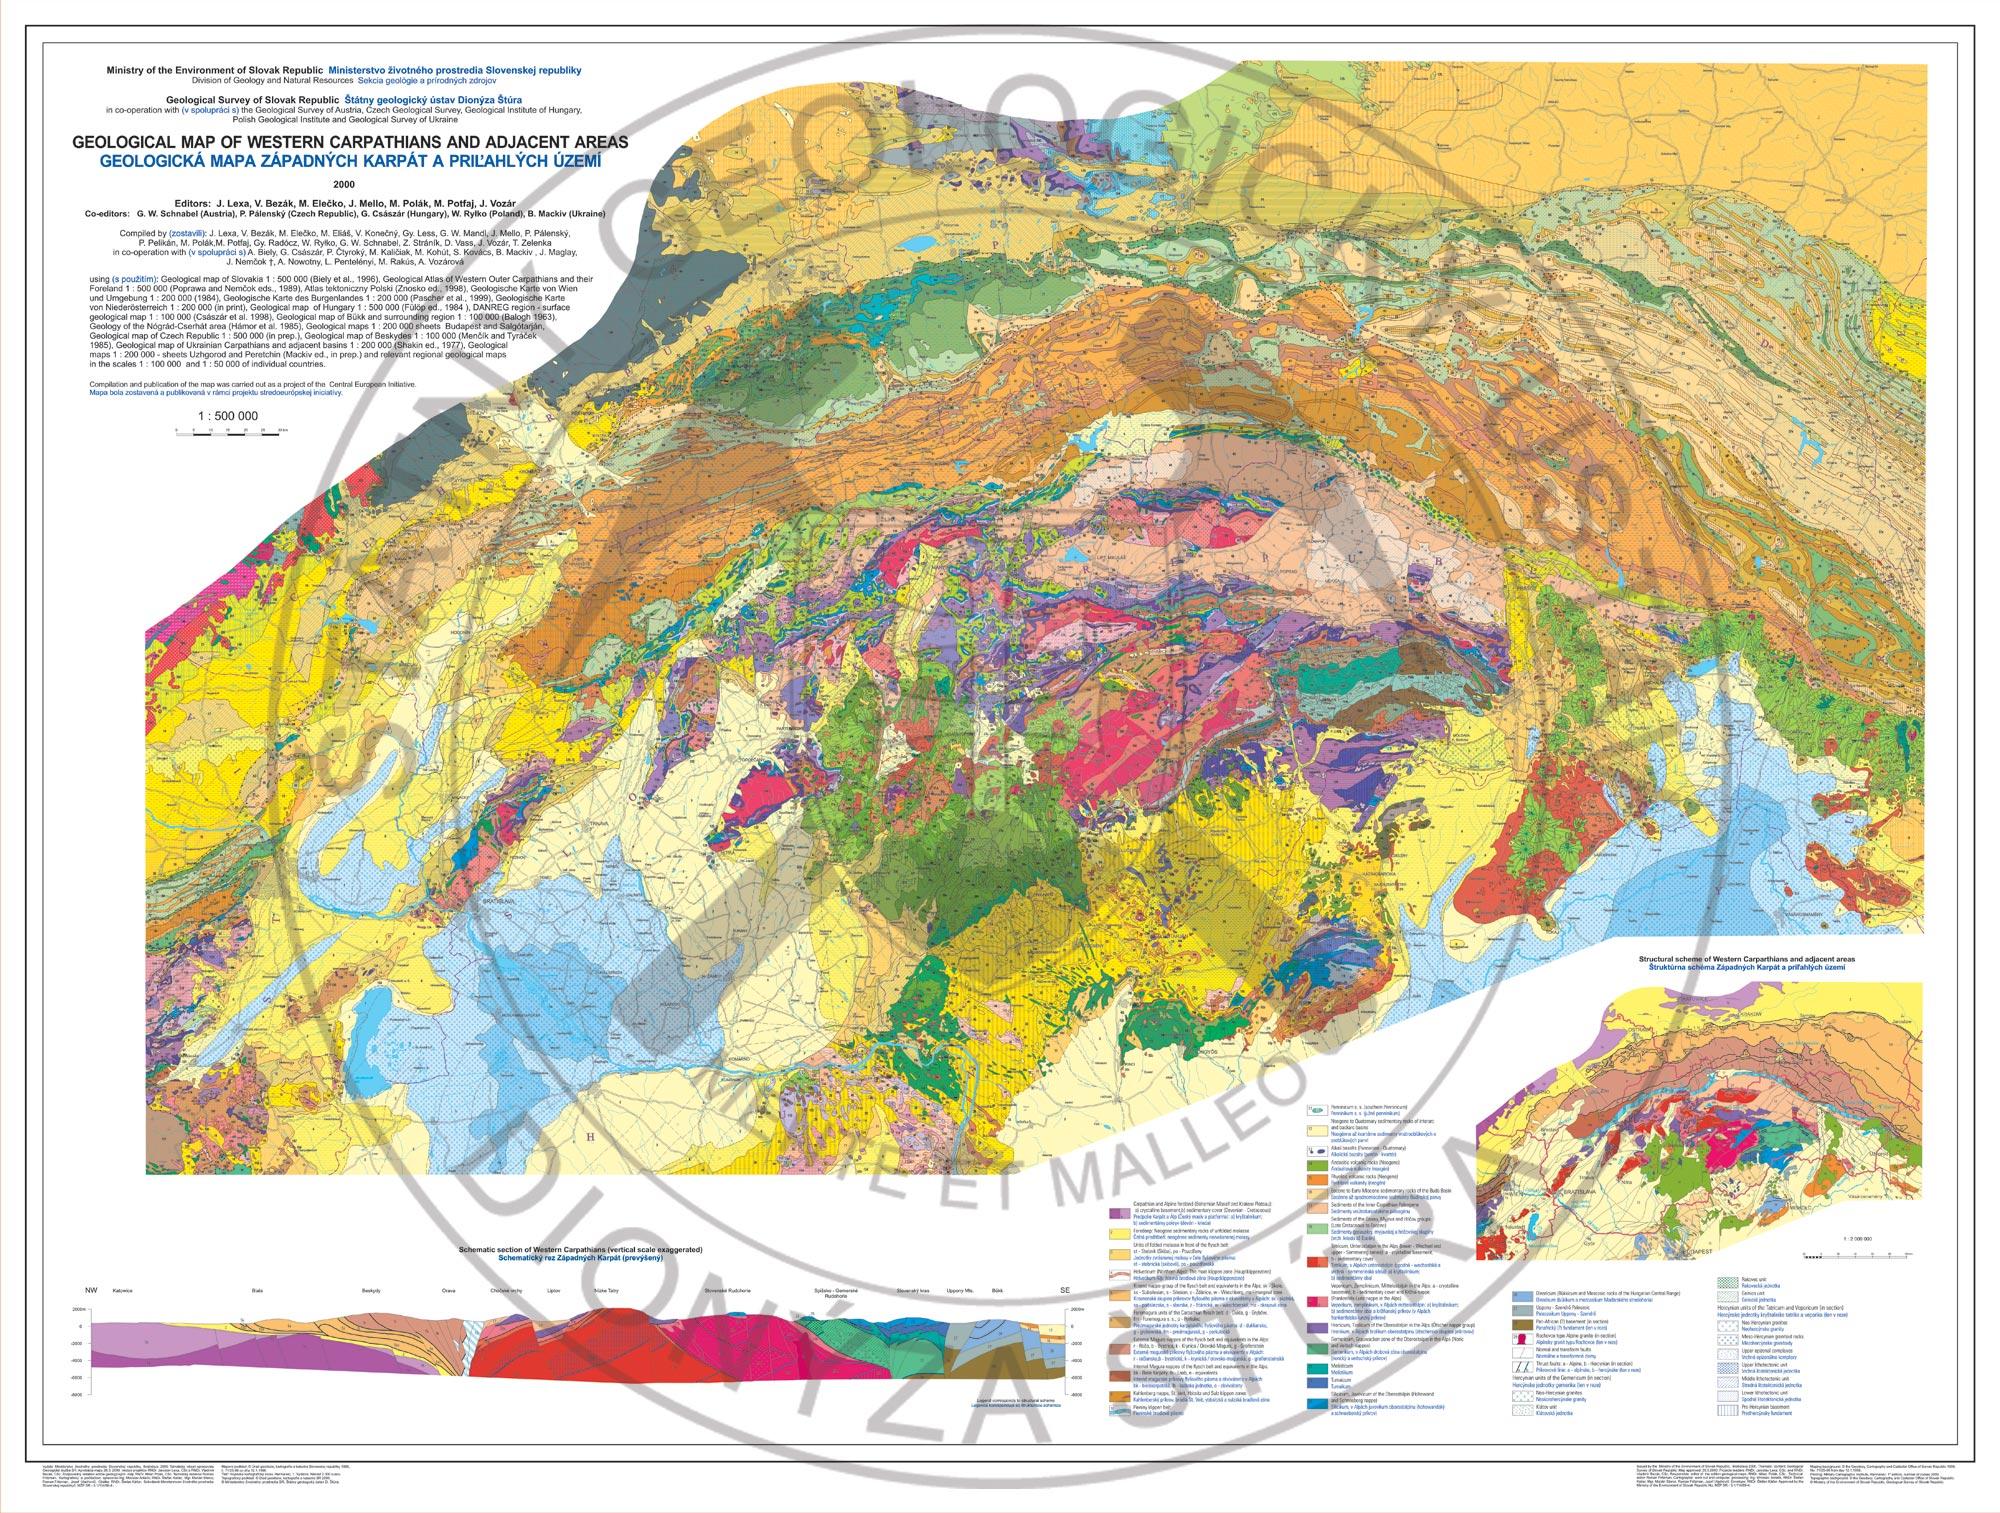 Geologic Map Of The Us.Geological Maps Sgids Statny Geologicky Ustav Dionyza Stura